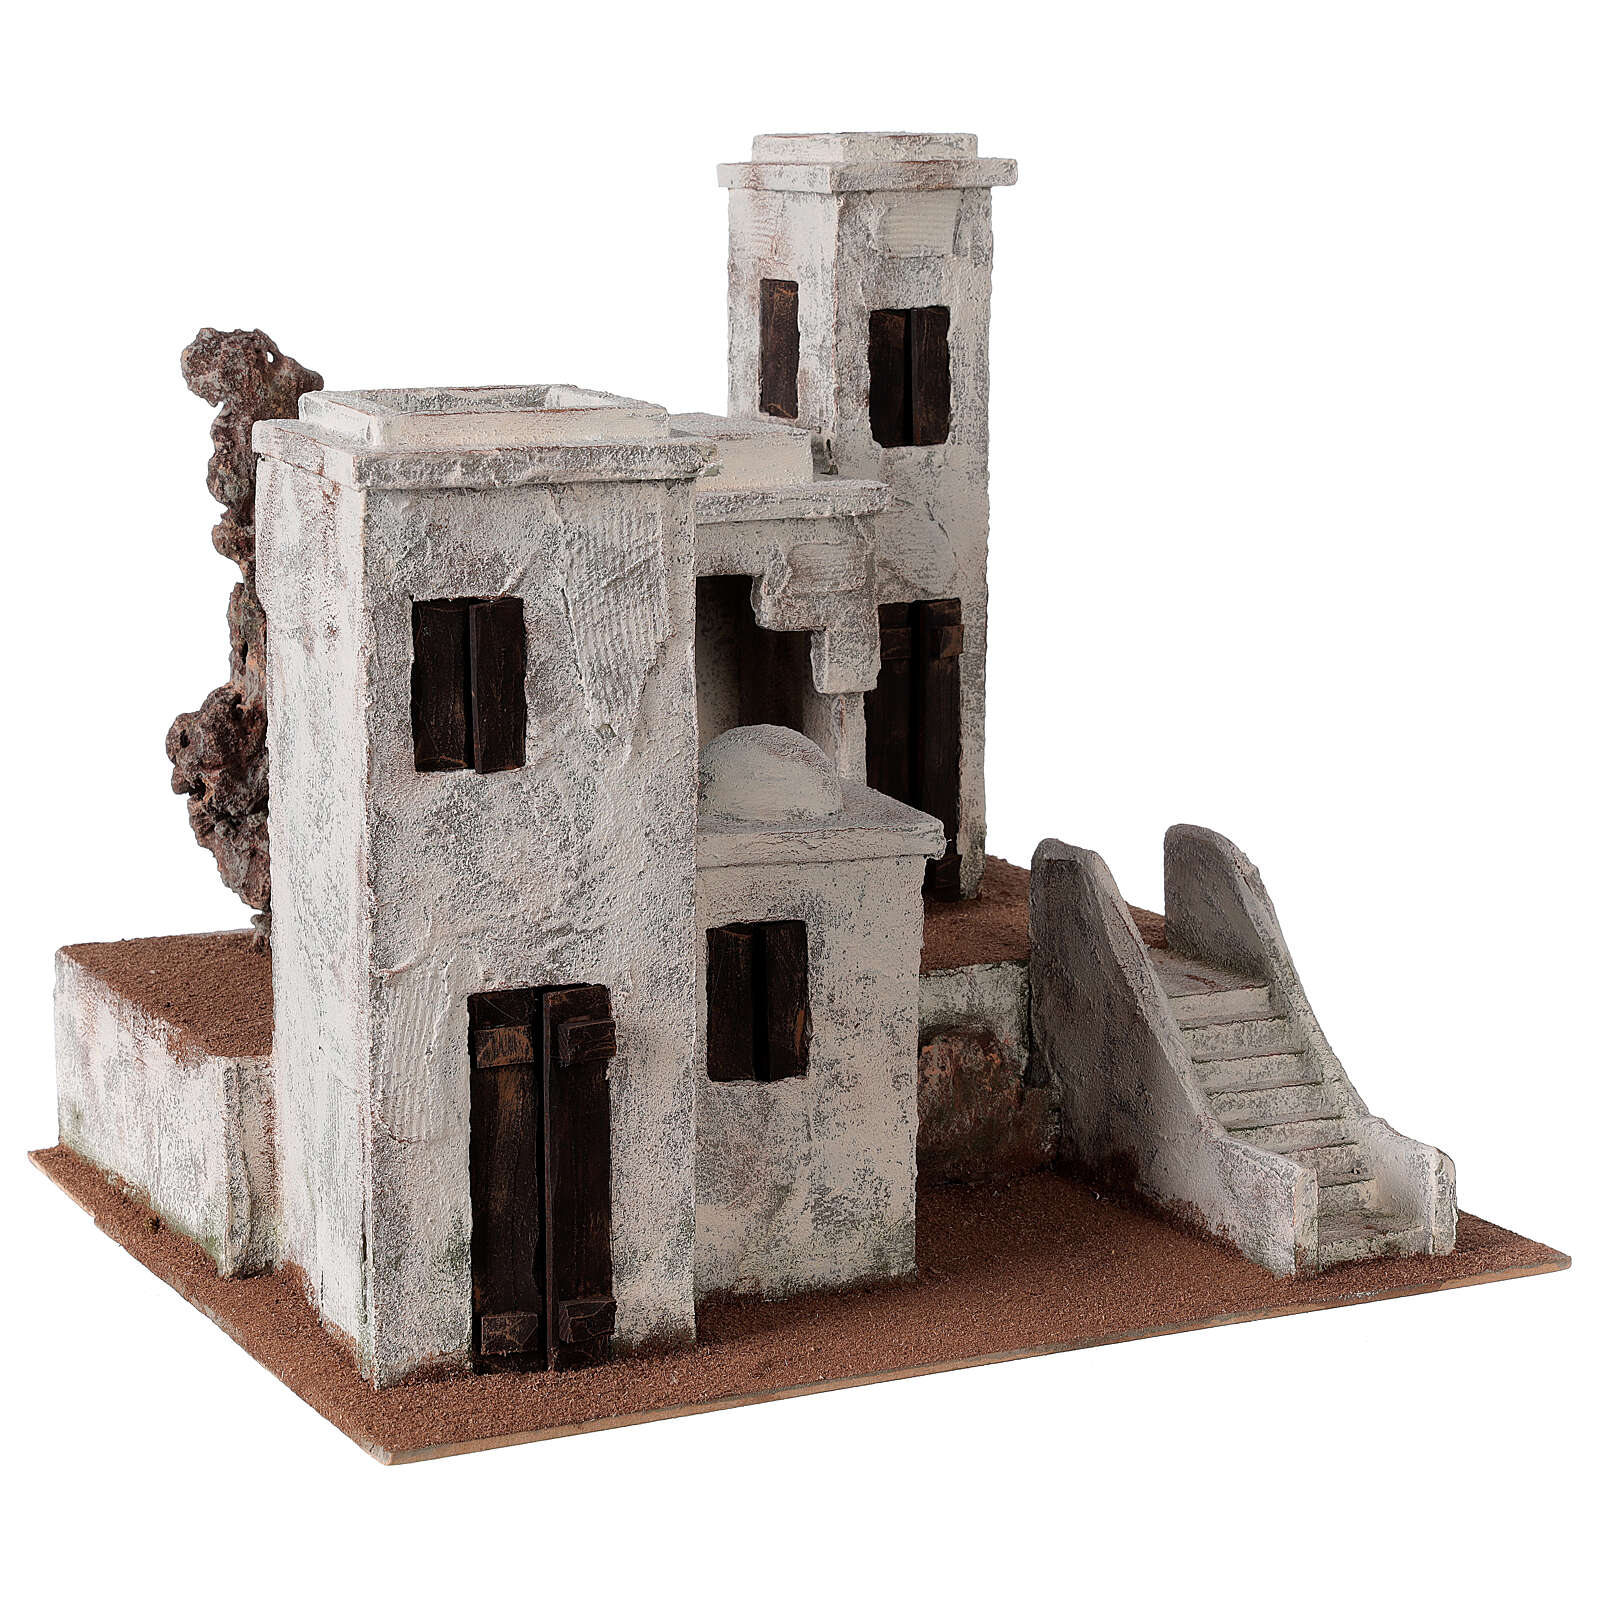 Borgo arabo presepe palestinese 40x45x38 per statue 12 cm 4